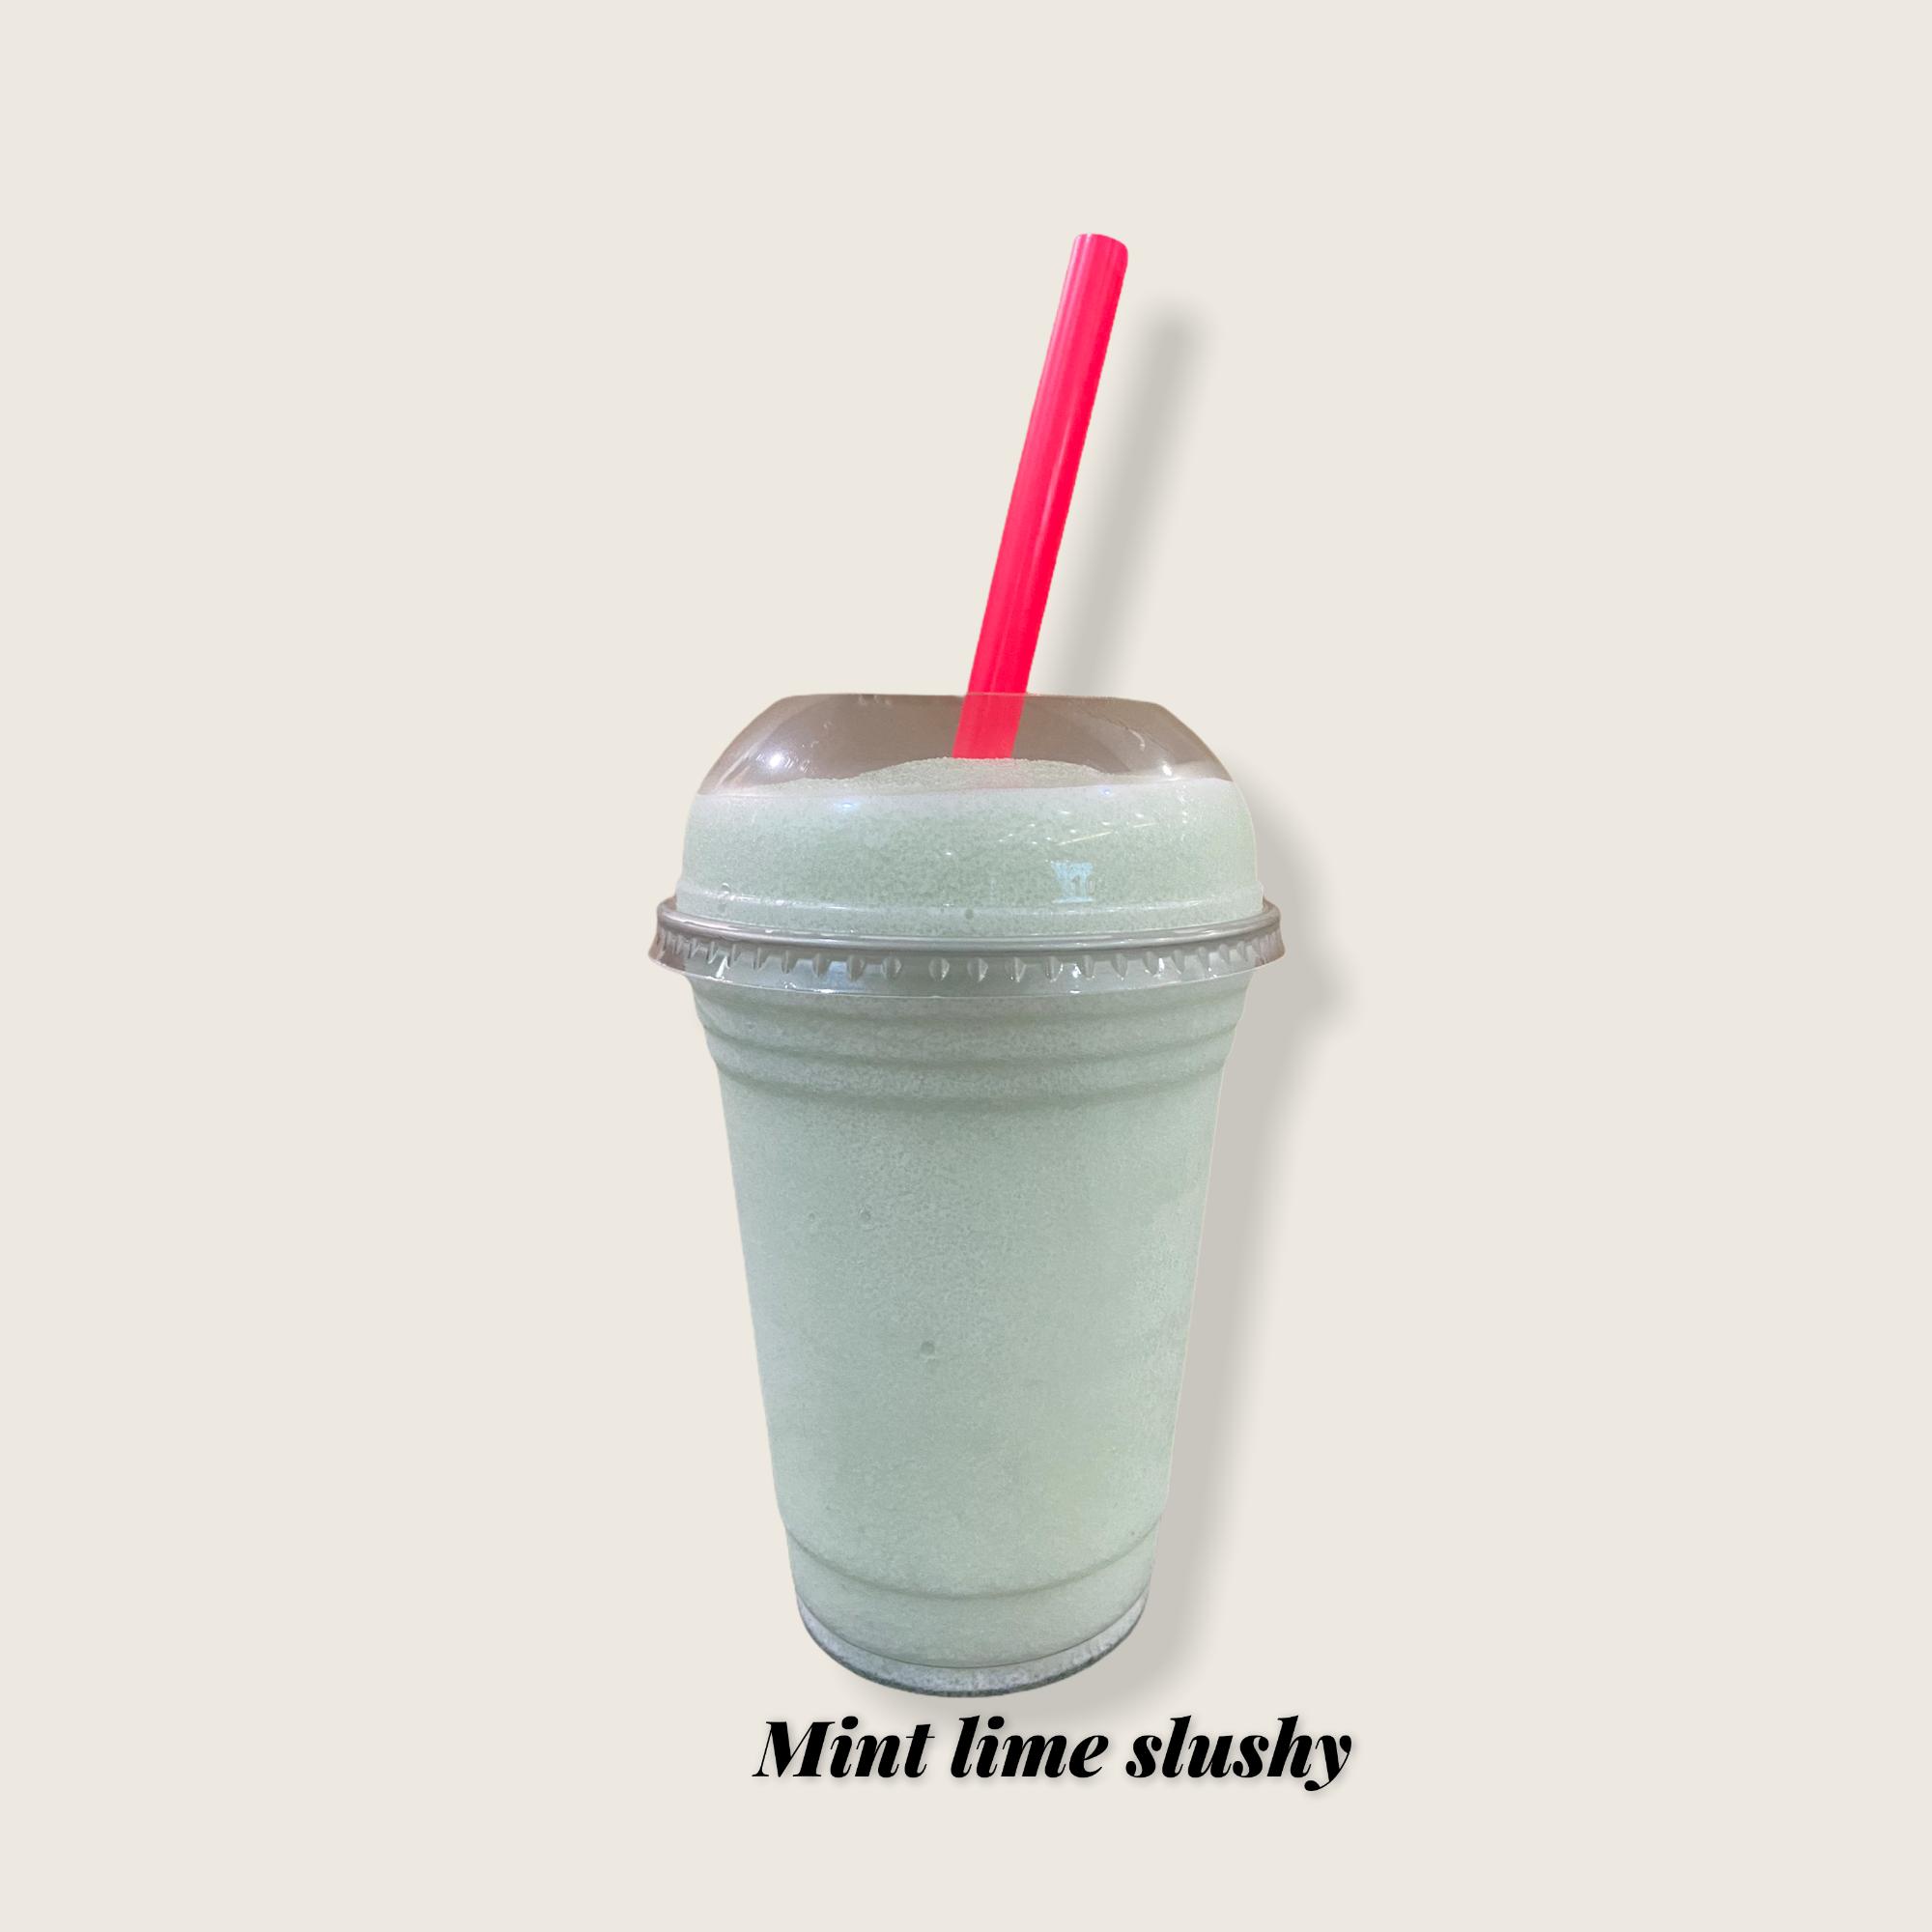 Mint lime slushy